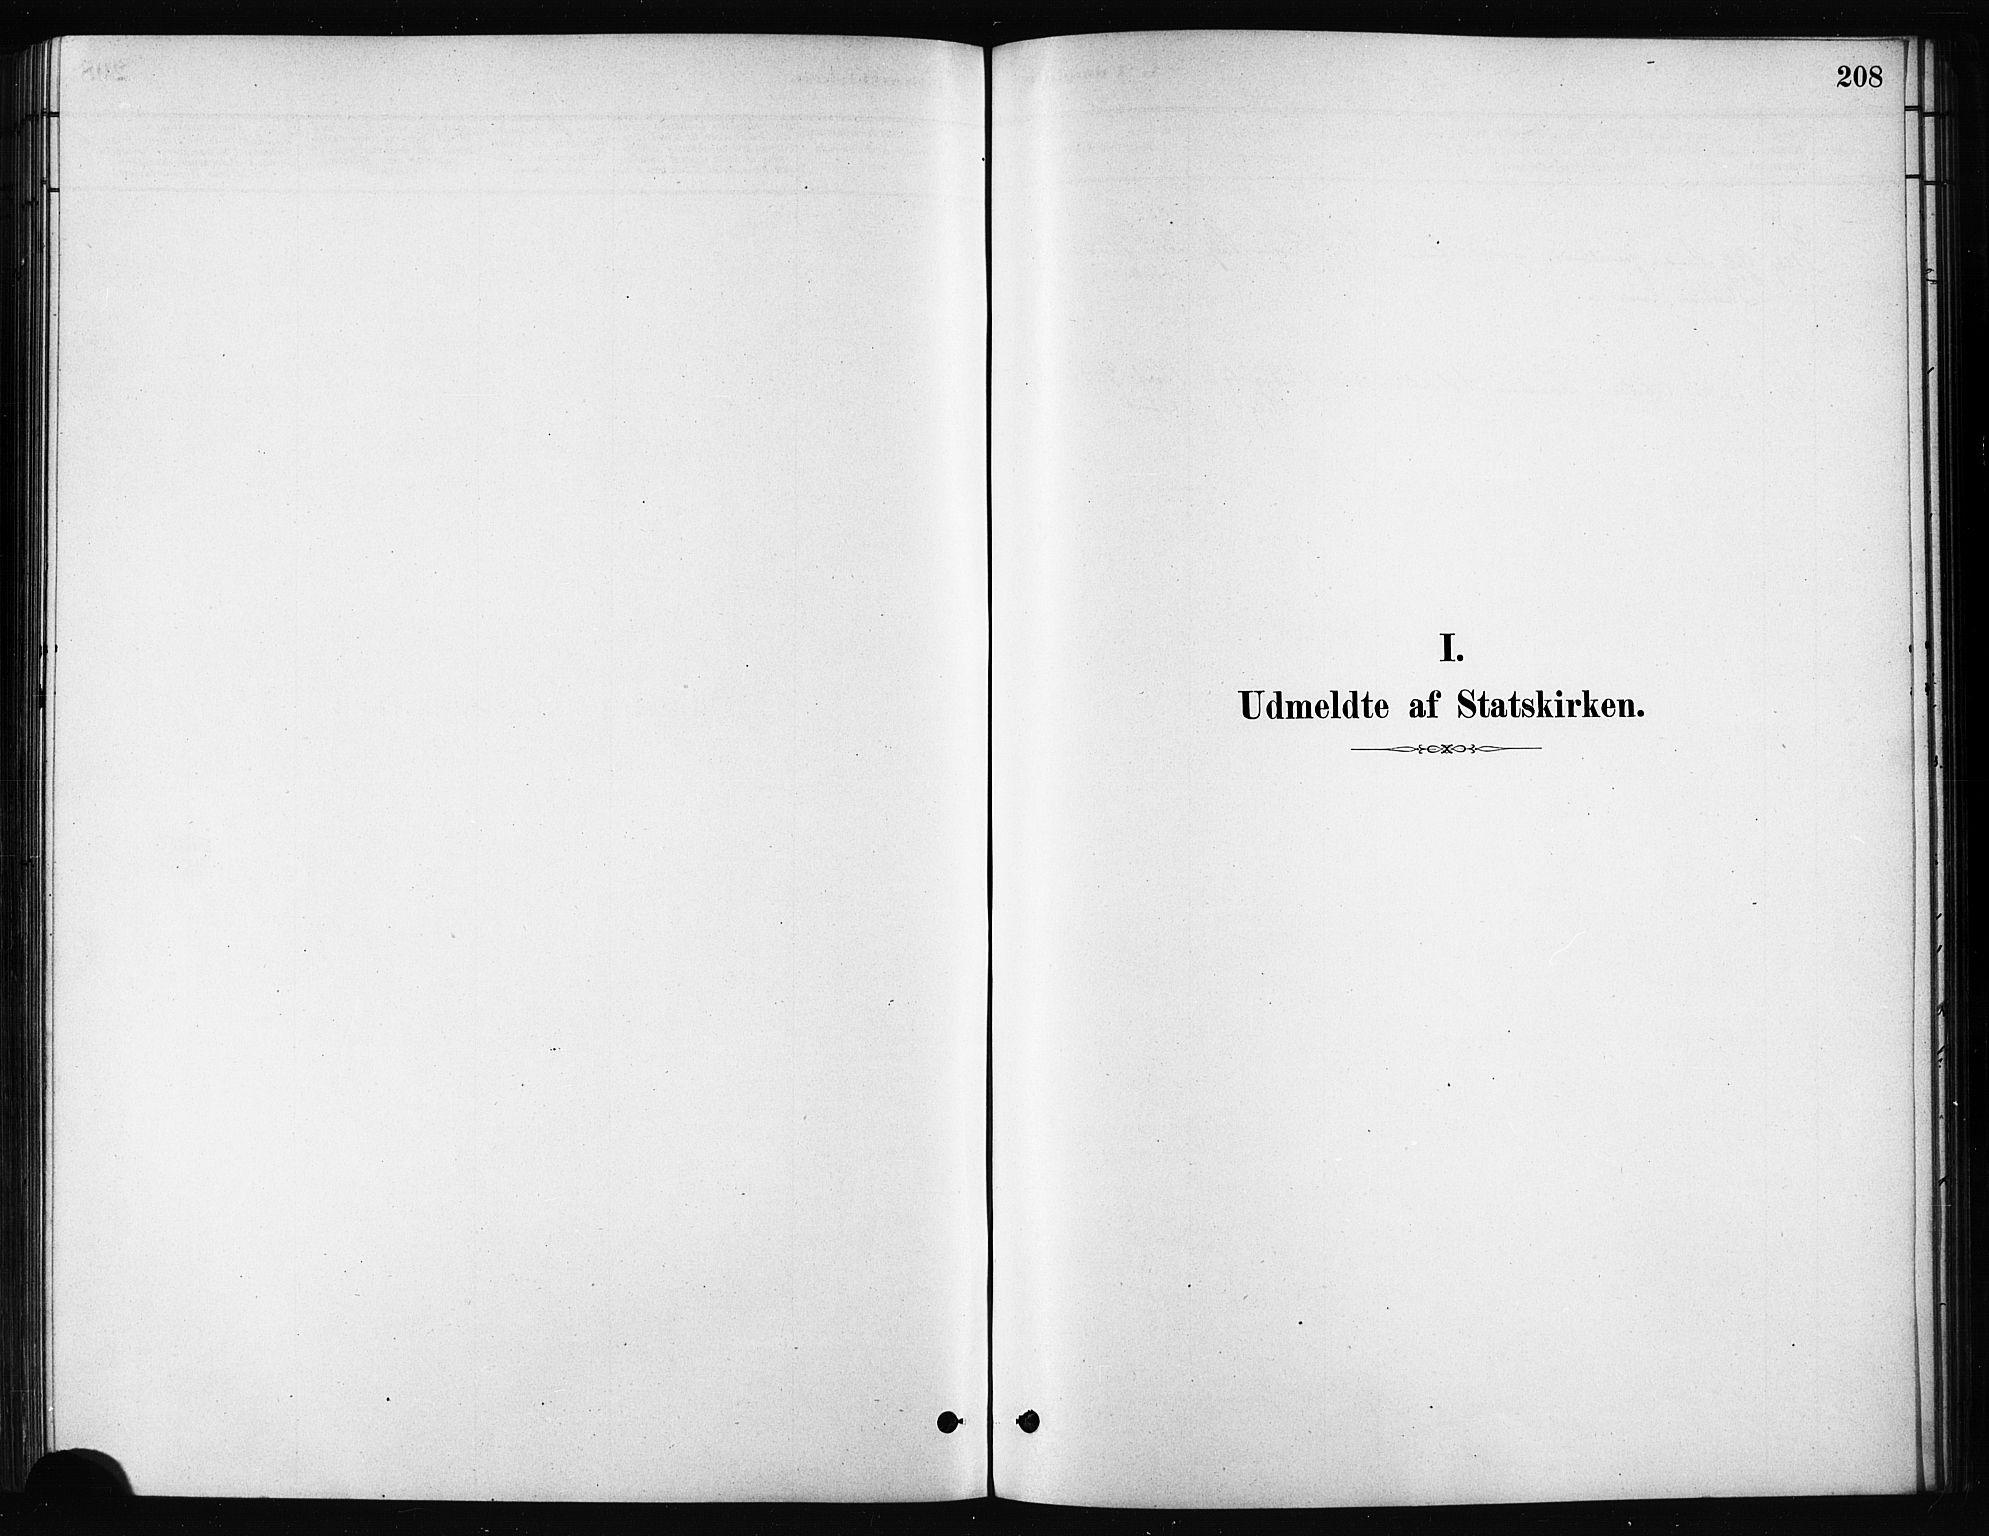 SATØ, Karlsøy sokneprestembete, H/Ha/Haa/L0011kirke: Parish register (official) no. 11, 1879-1892, p. 208